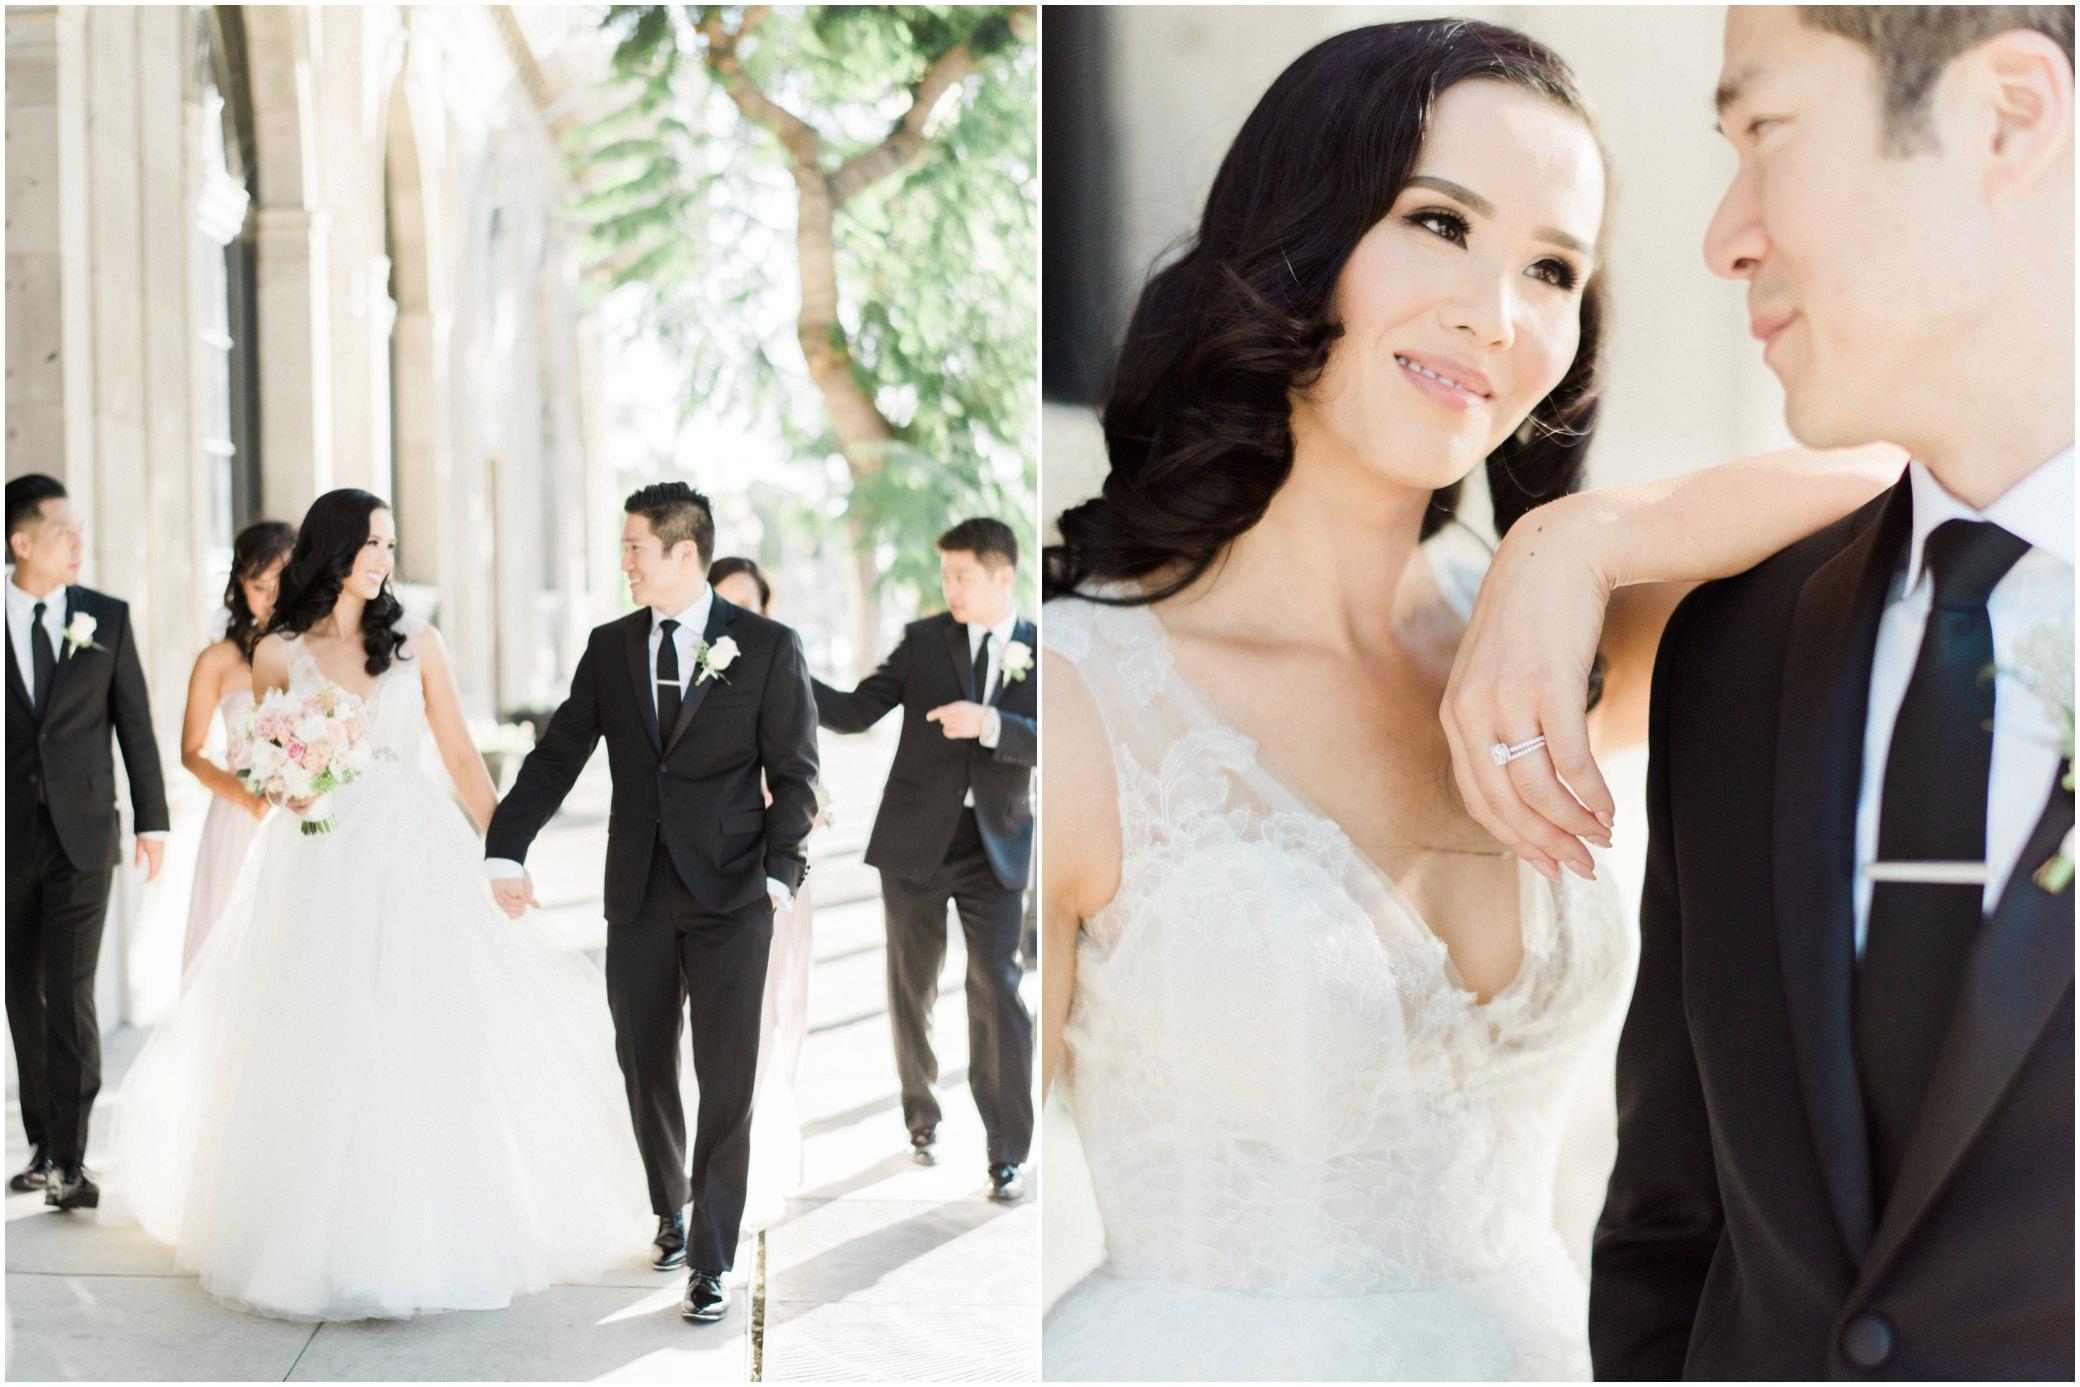 culver city hotel wedding photographer